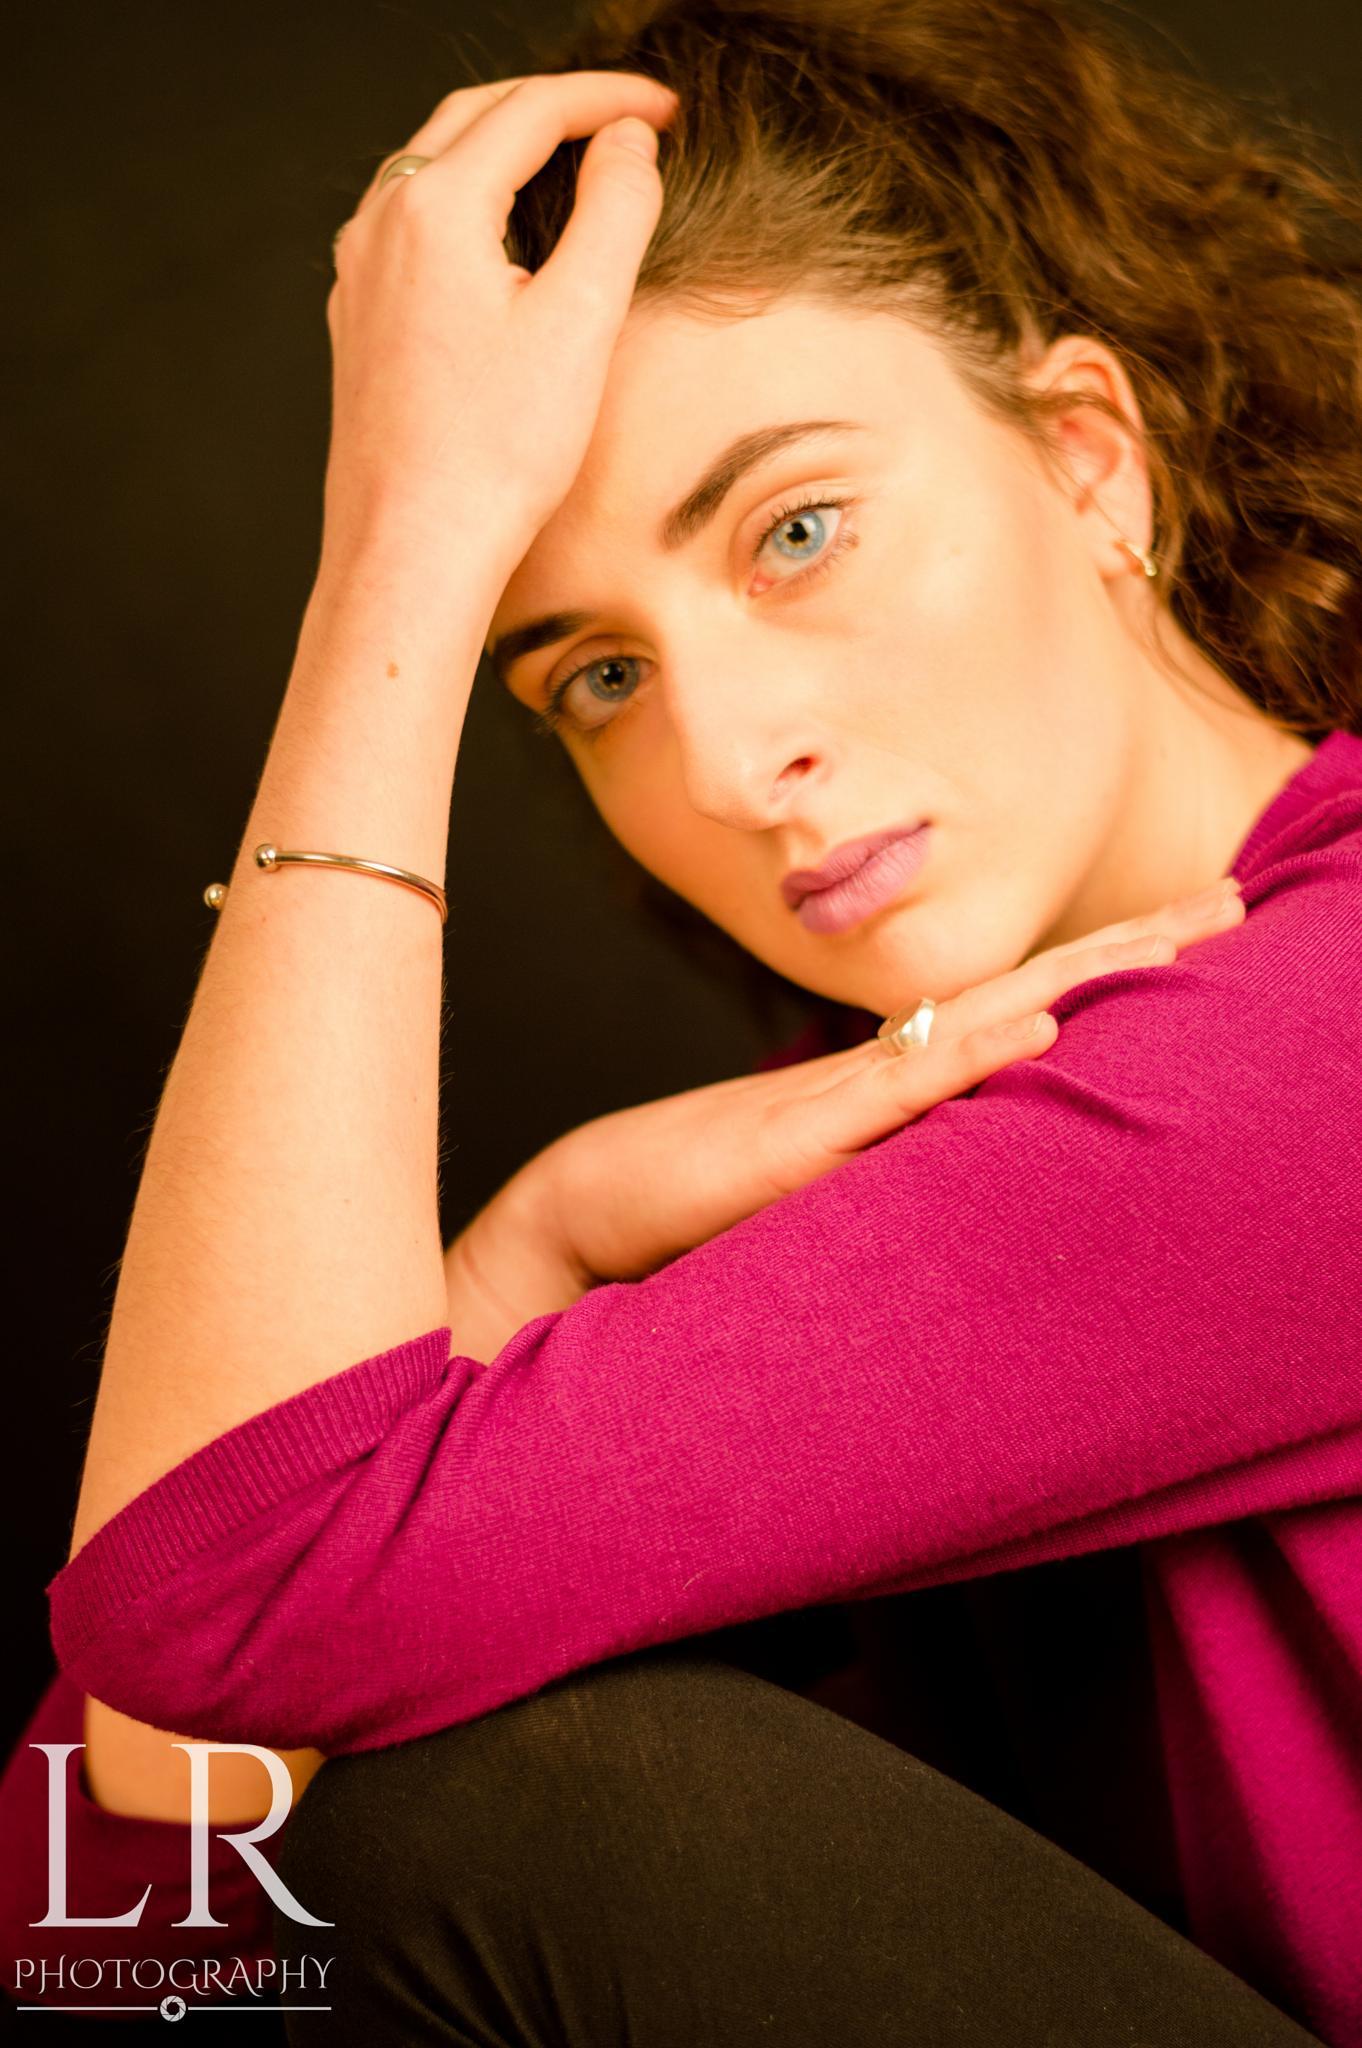 Female Portrait by lrichardsonphotography